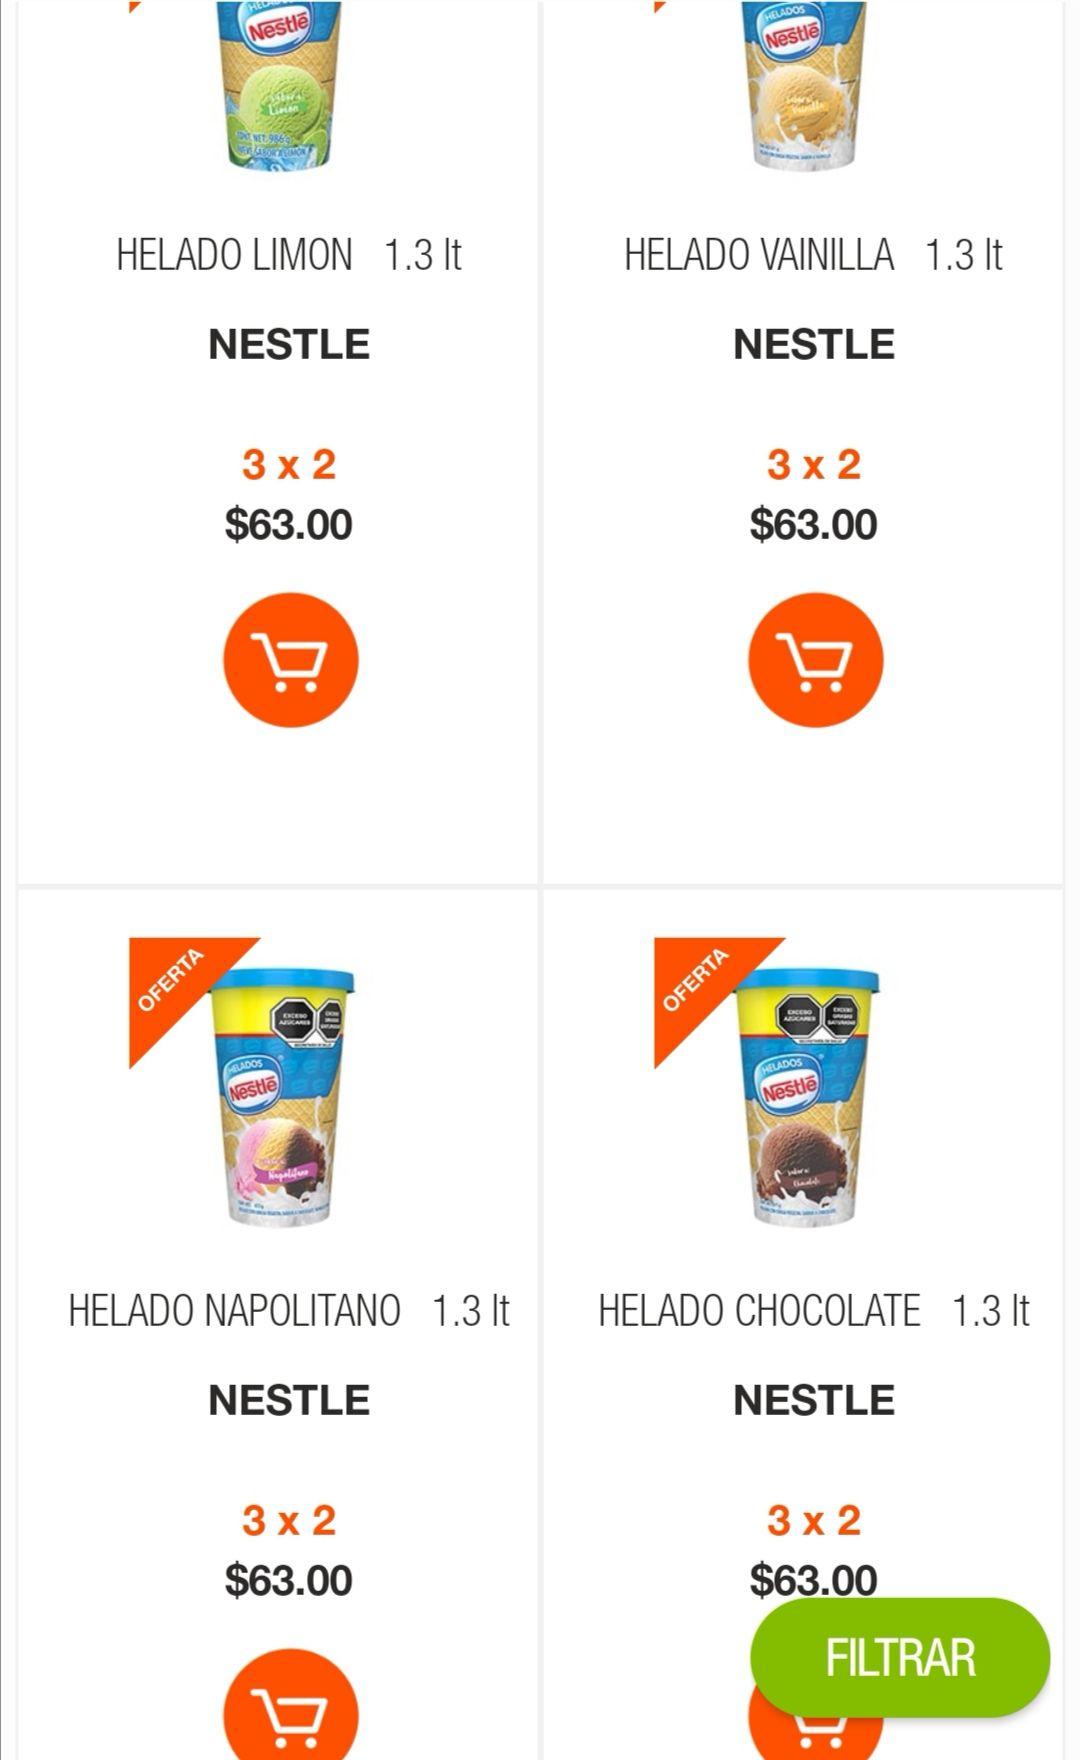 La Comer: 3 x 2 en helados Nestlé 1.3 L sabores napolitano, chocolate, vainilla, limón, fresa o grosella